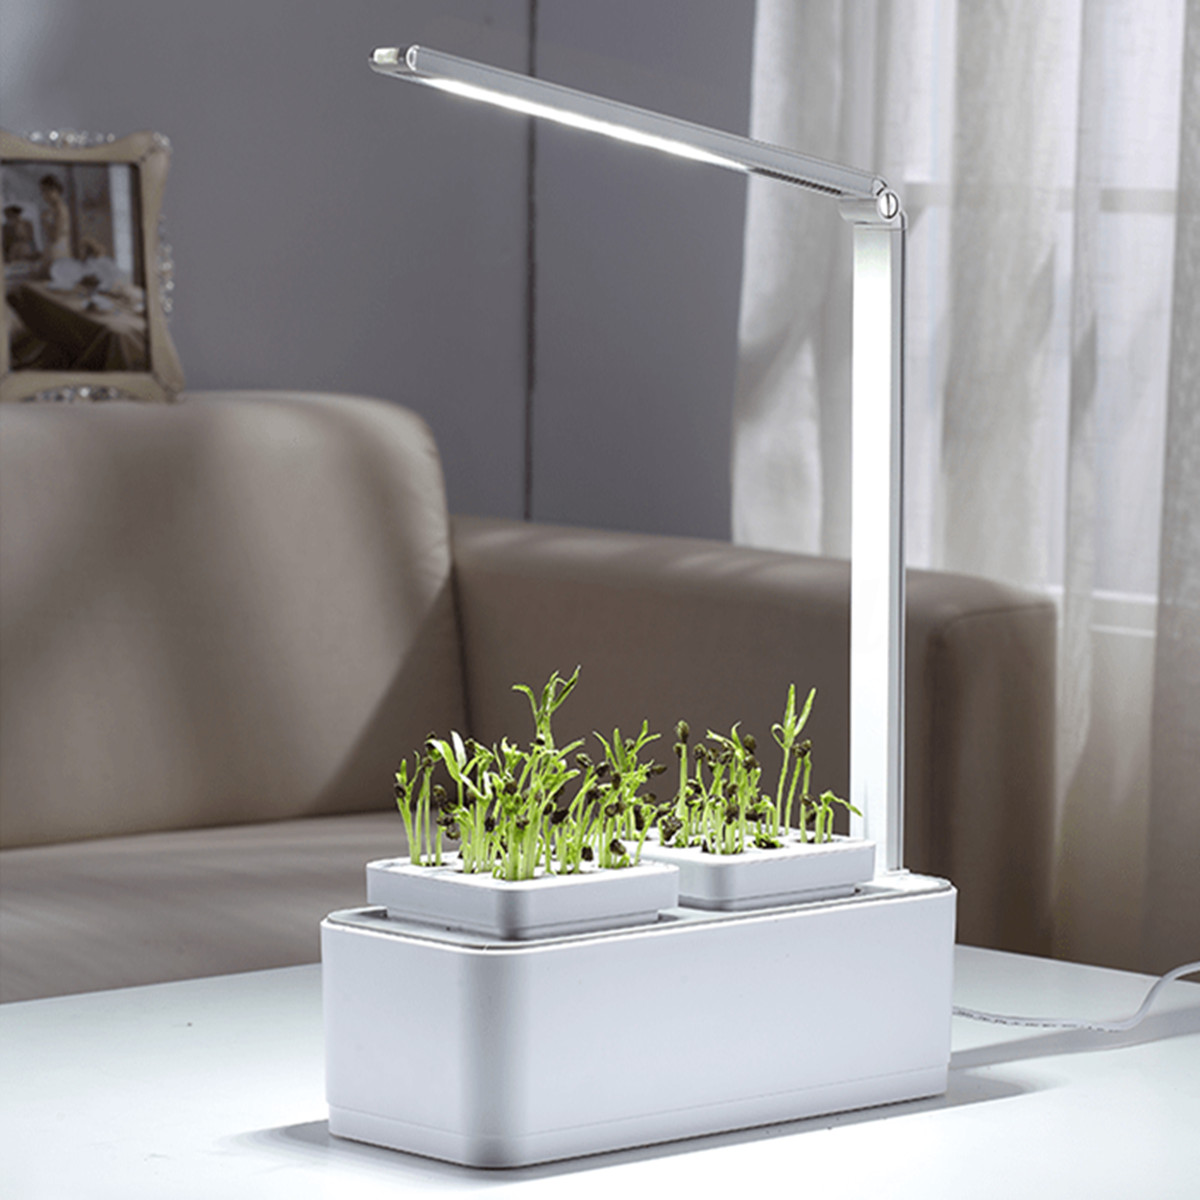 LED Light Automatic Flower Pots Planter Water absorbing Irrigation Plant Lamp Nursery Pots Indoor Decoration Garden Supplies